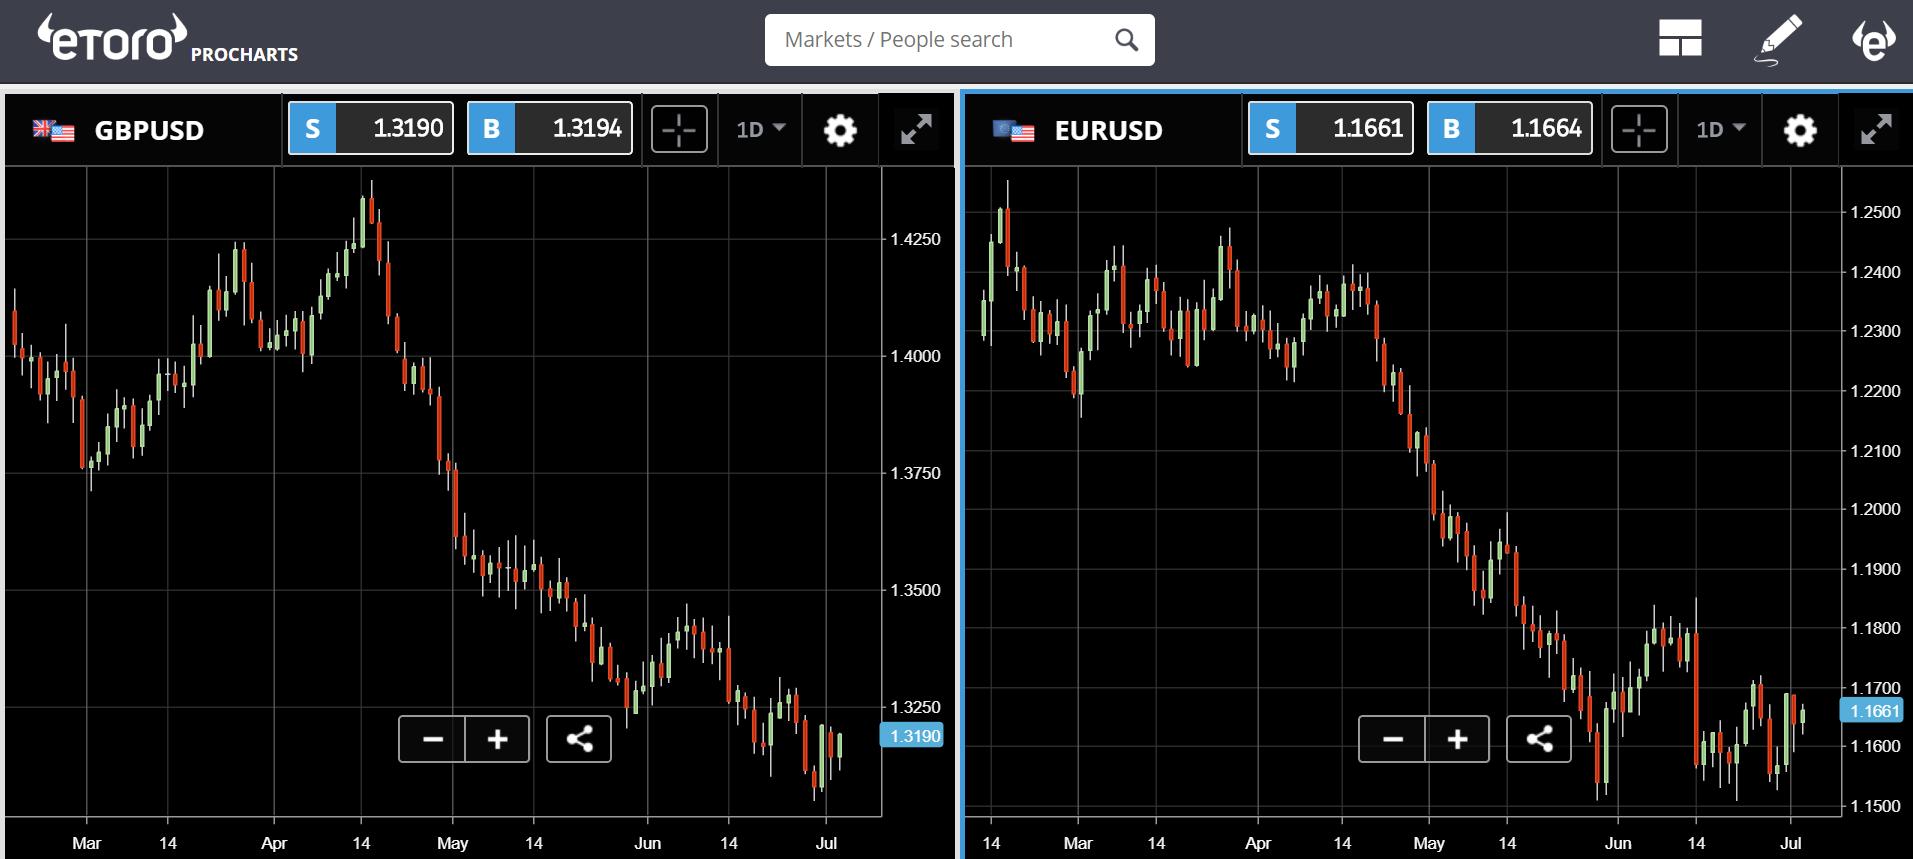 cryptocurrencies, etoro, trading, markets, mining